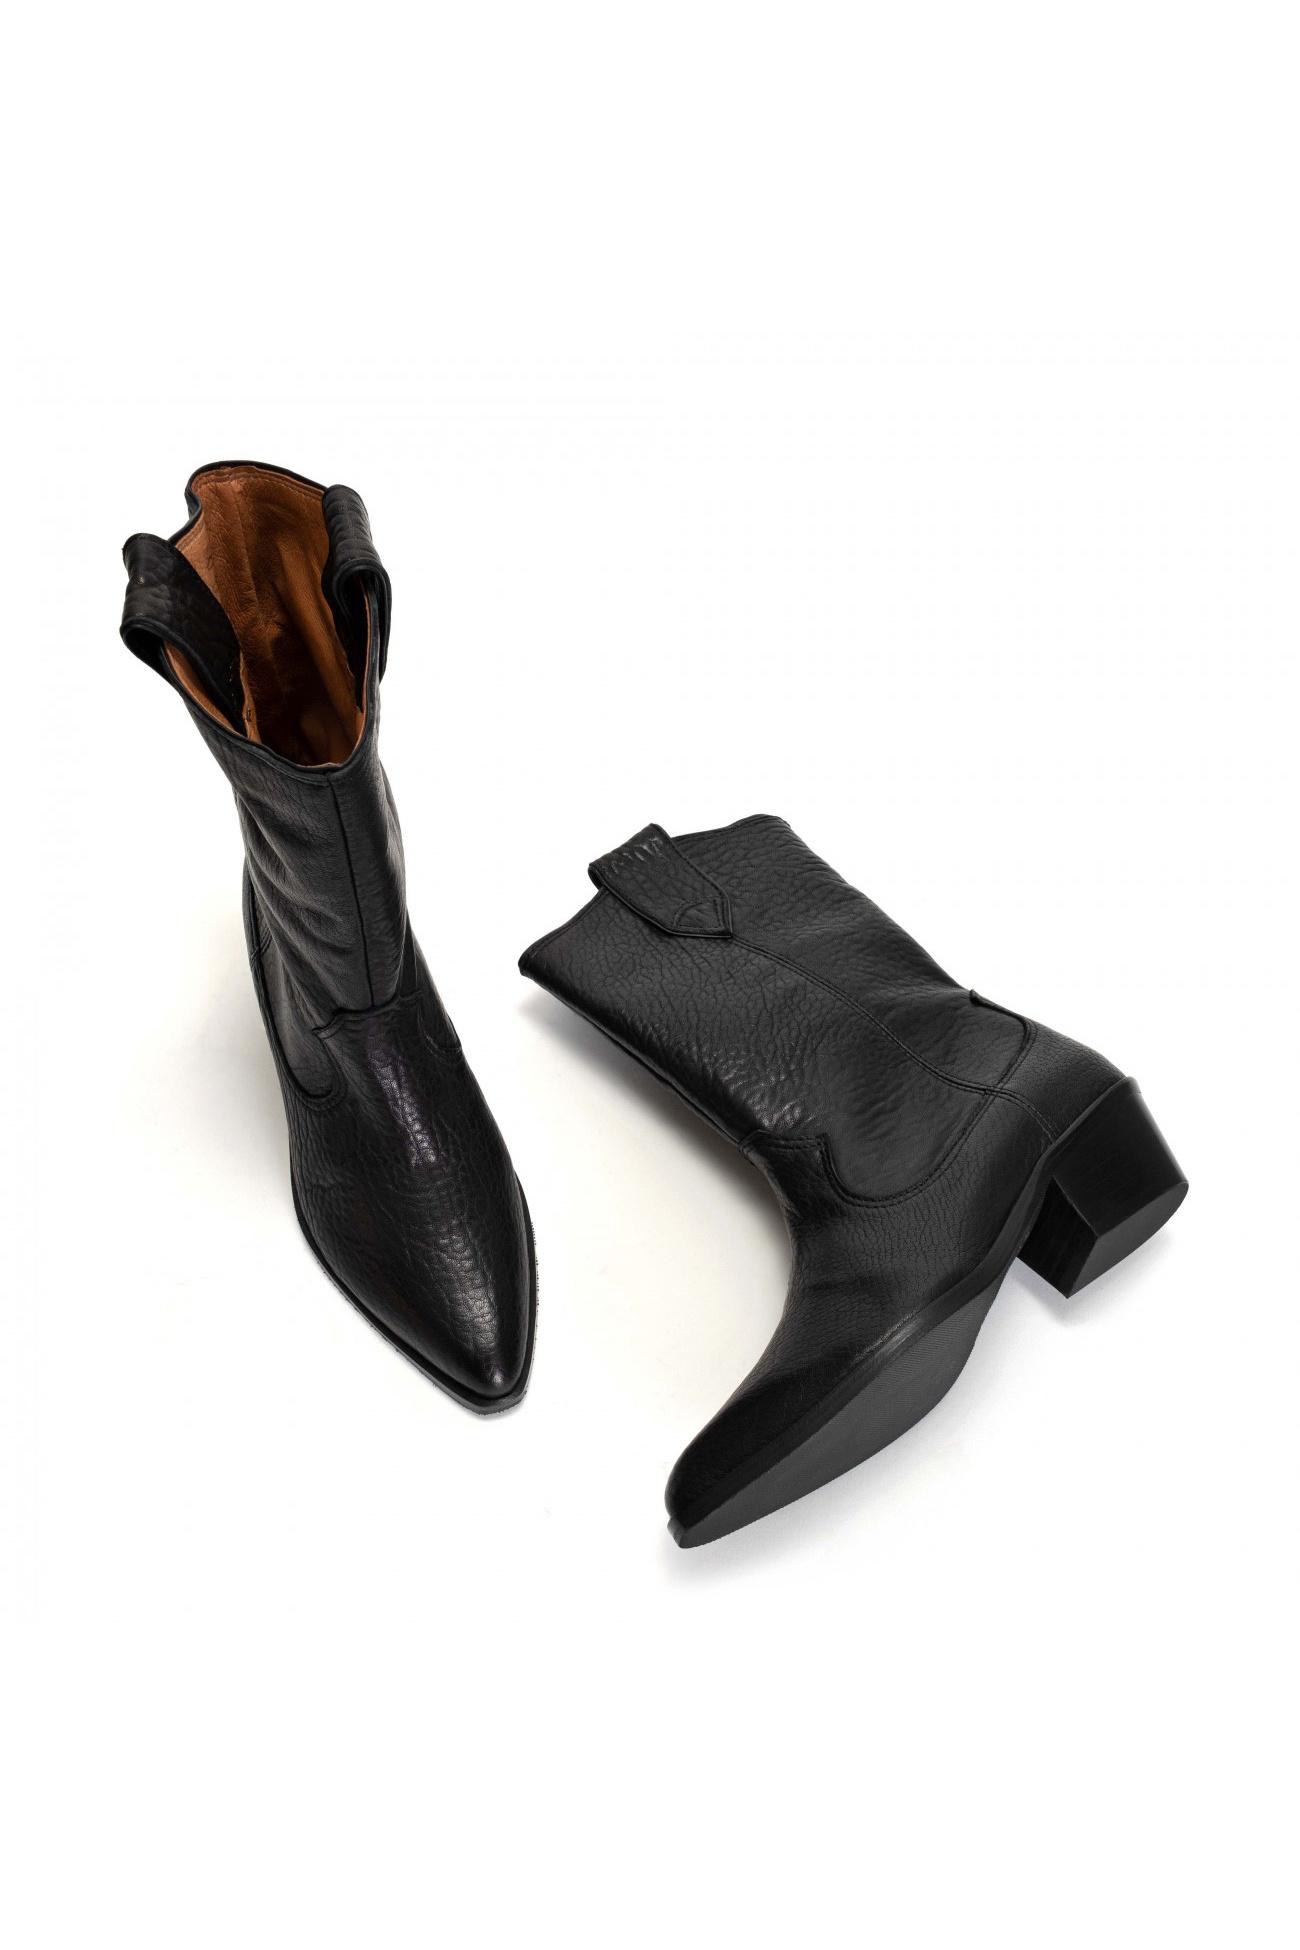 Saseline 35 Heavy Grain Calf Boot - Black-3